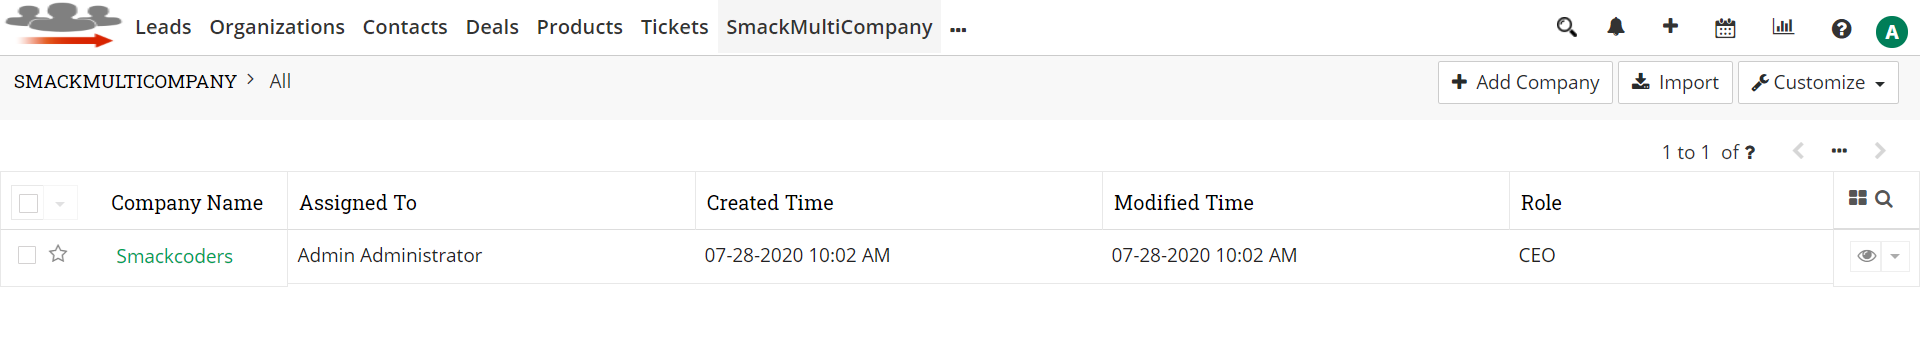 joforce_multi_company_list_view